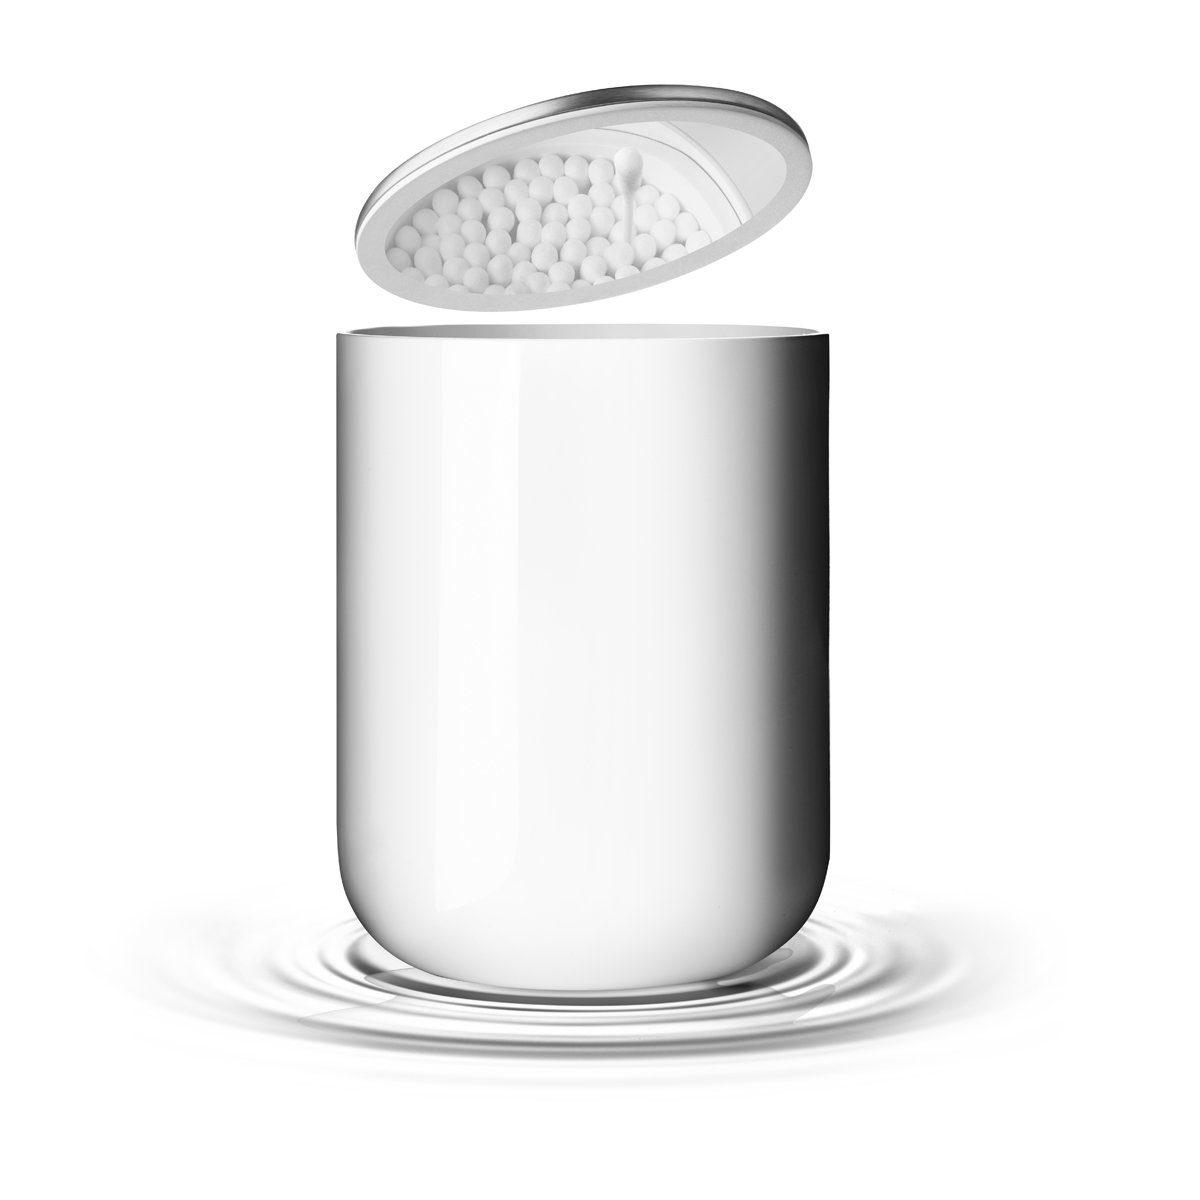 MENU Menu Container weiss